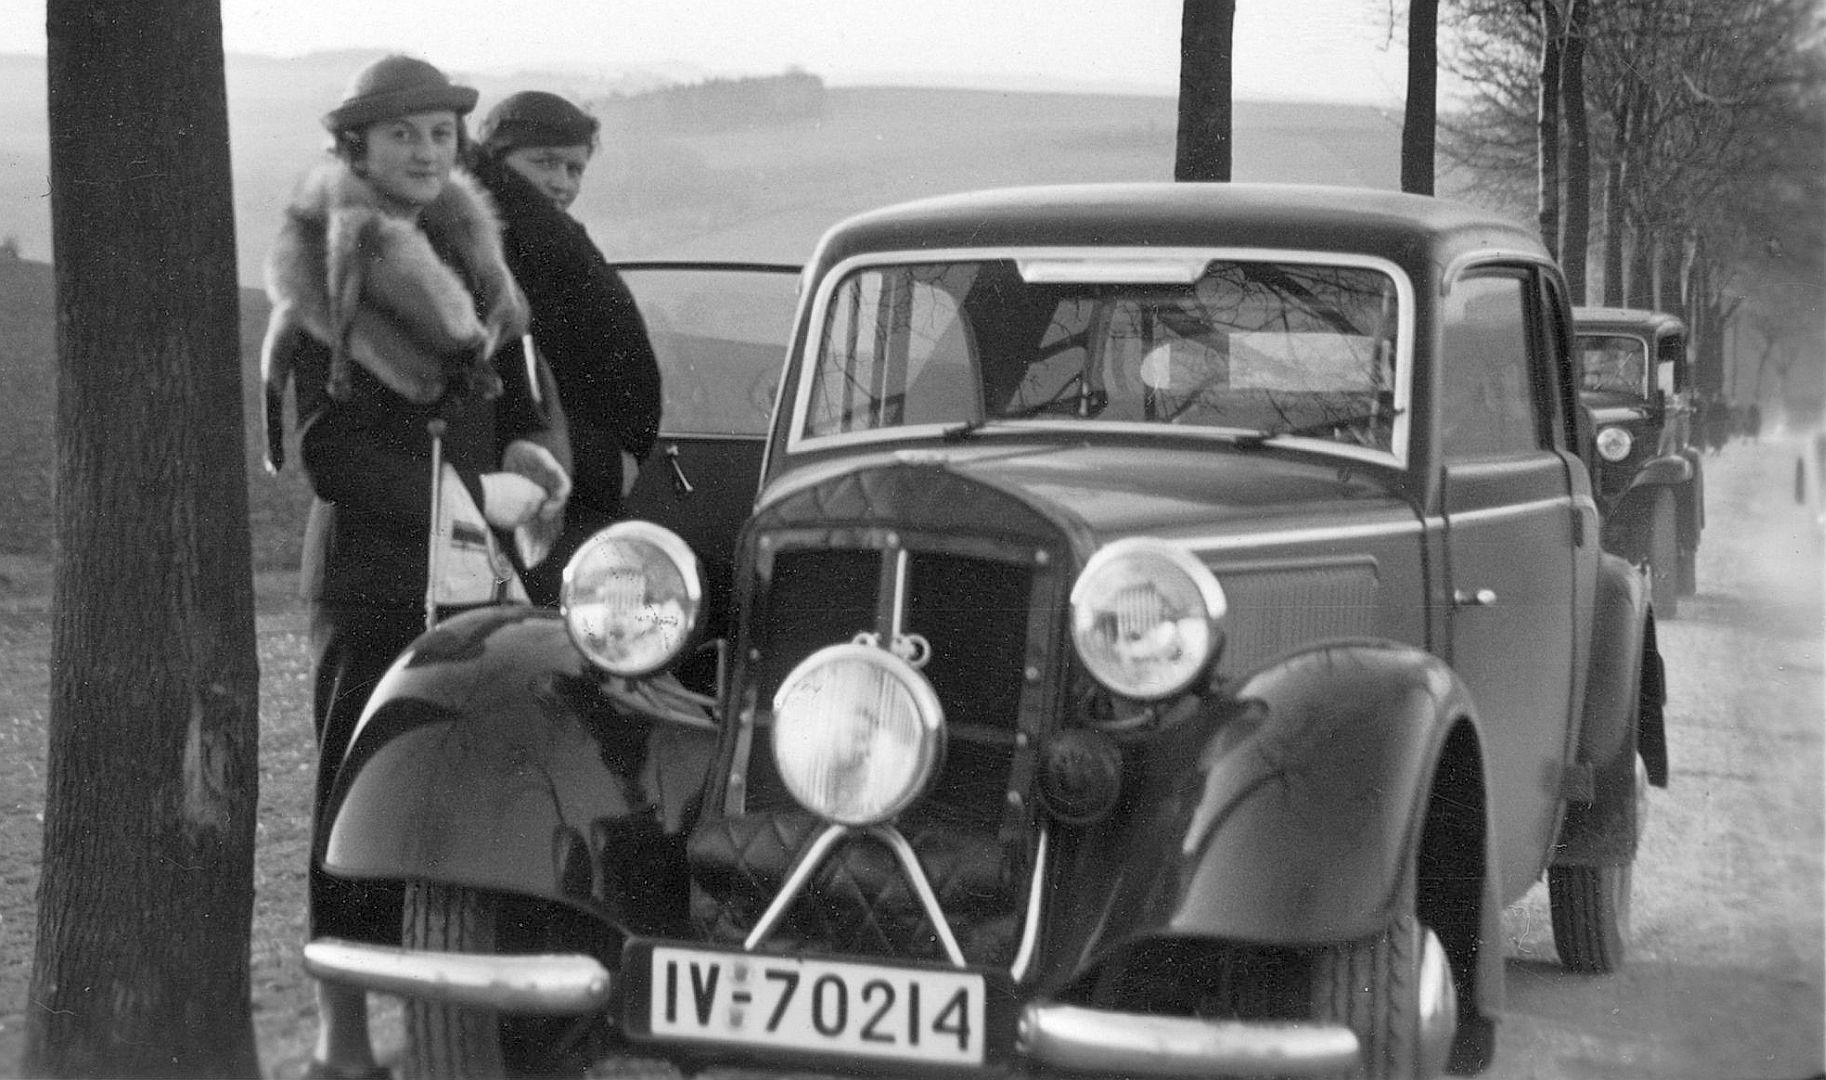 DKW_F7_Meisterklasse_1937_03-1938_Foto_Wilsdruf_Galerie